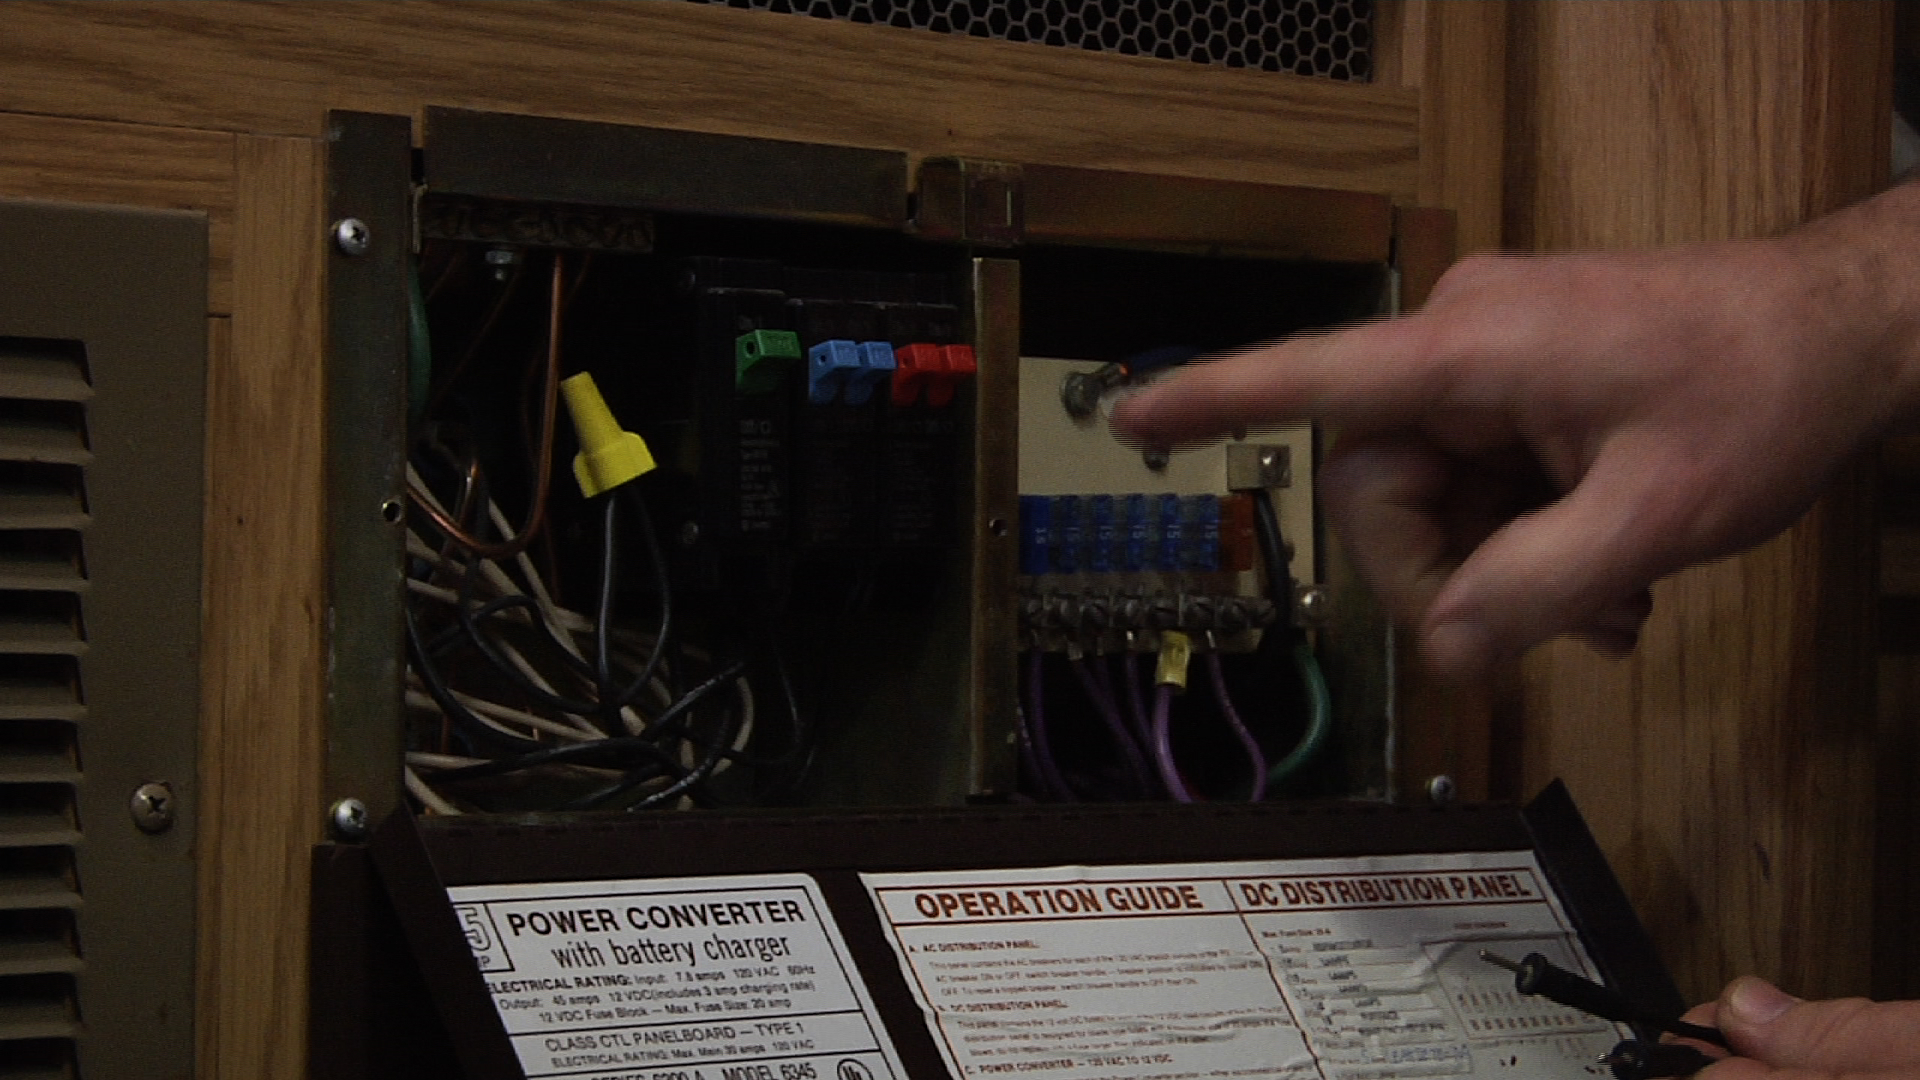 RV Power Converter Troubleshooting | RV Repair ClubRV Repair Club